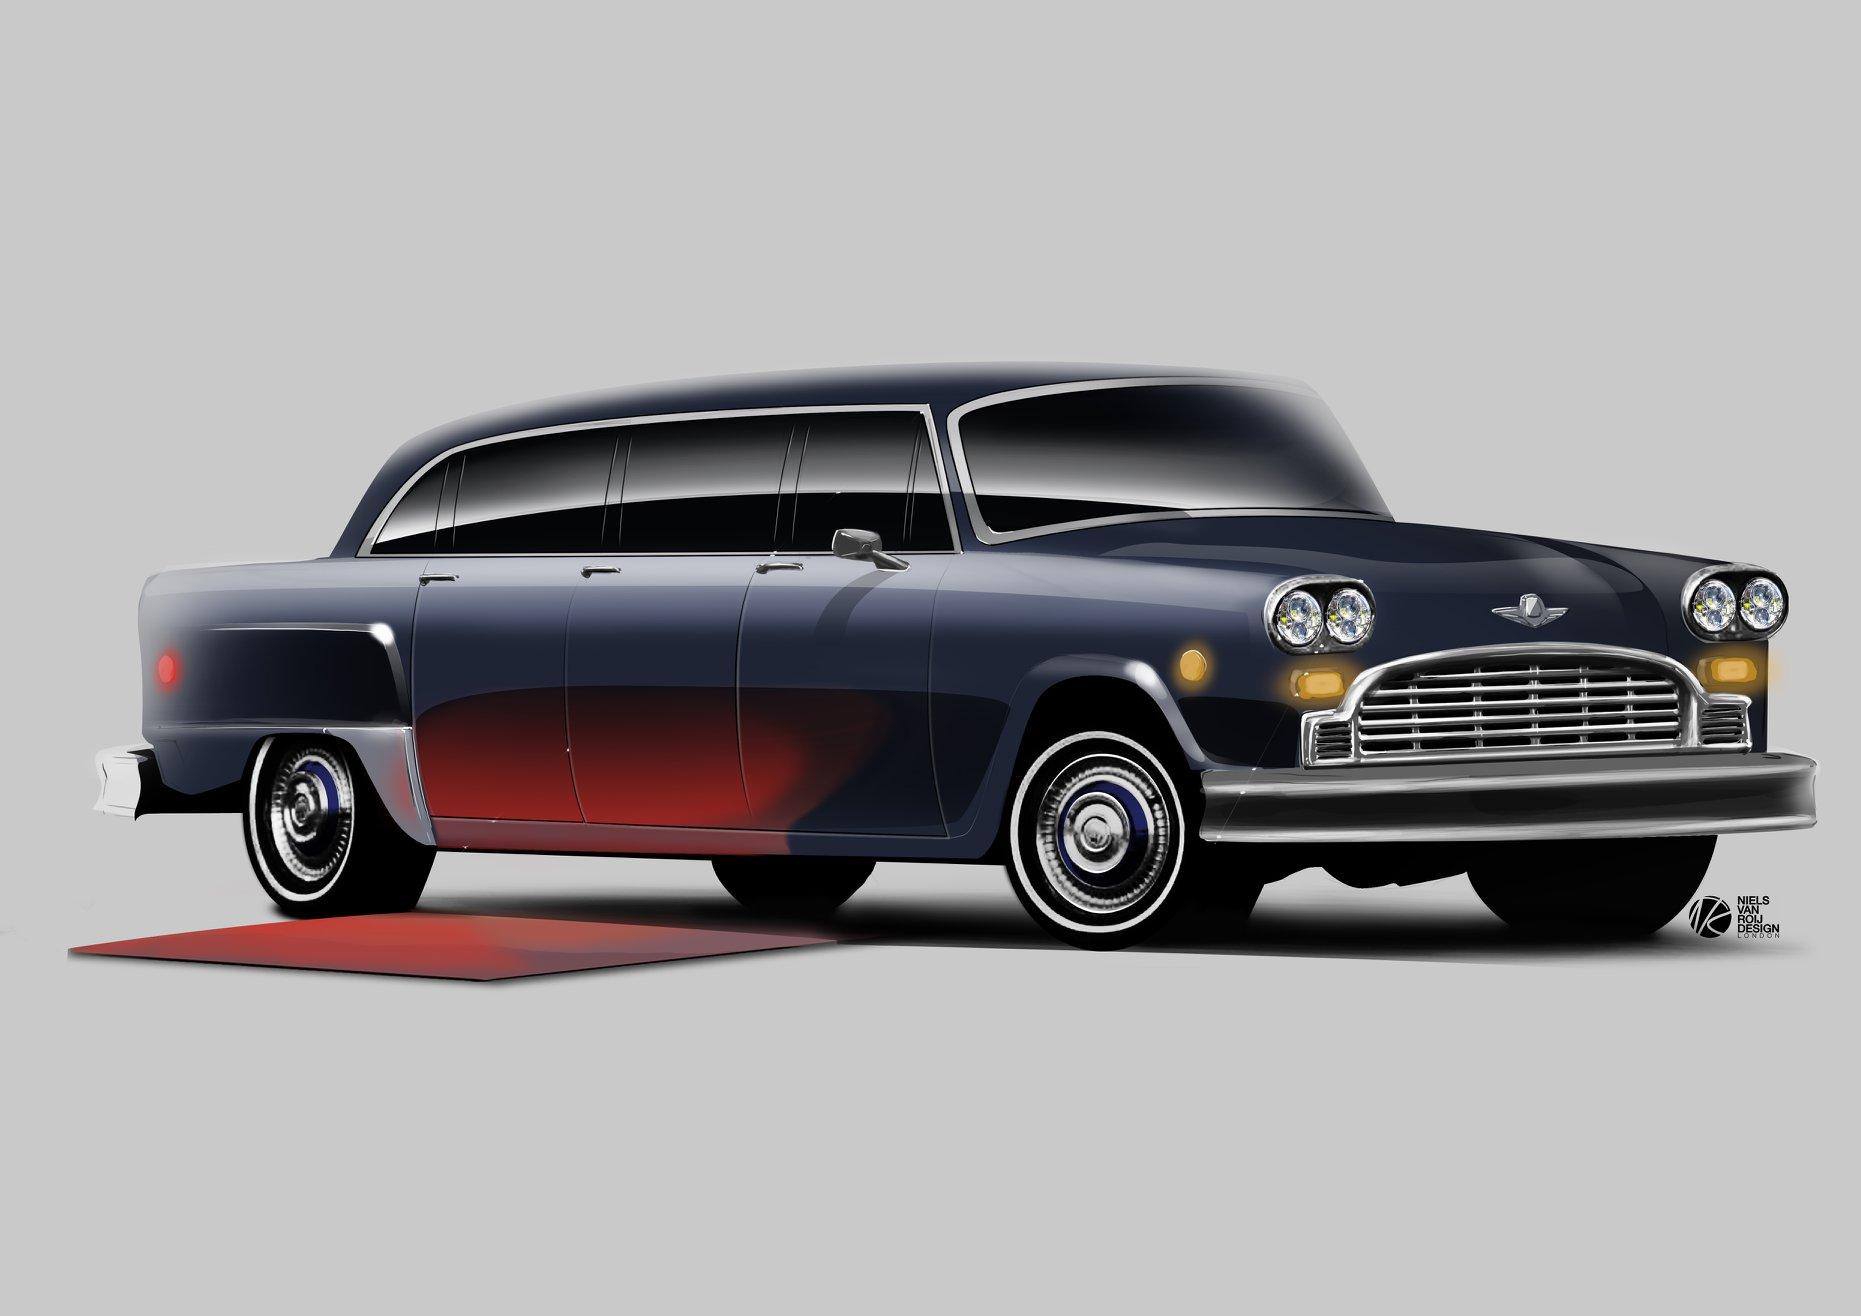 Vip-car-3